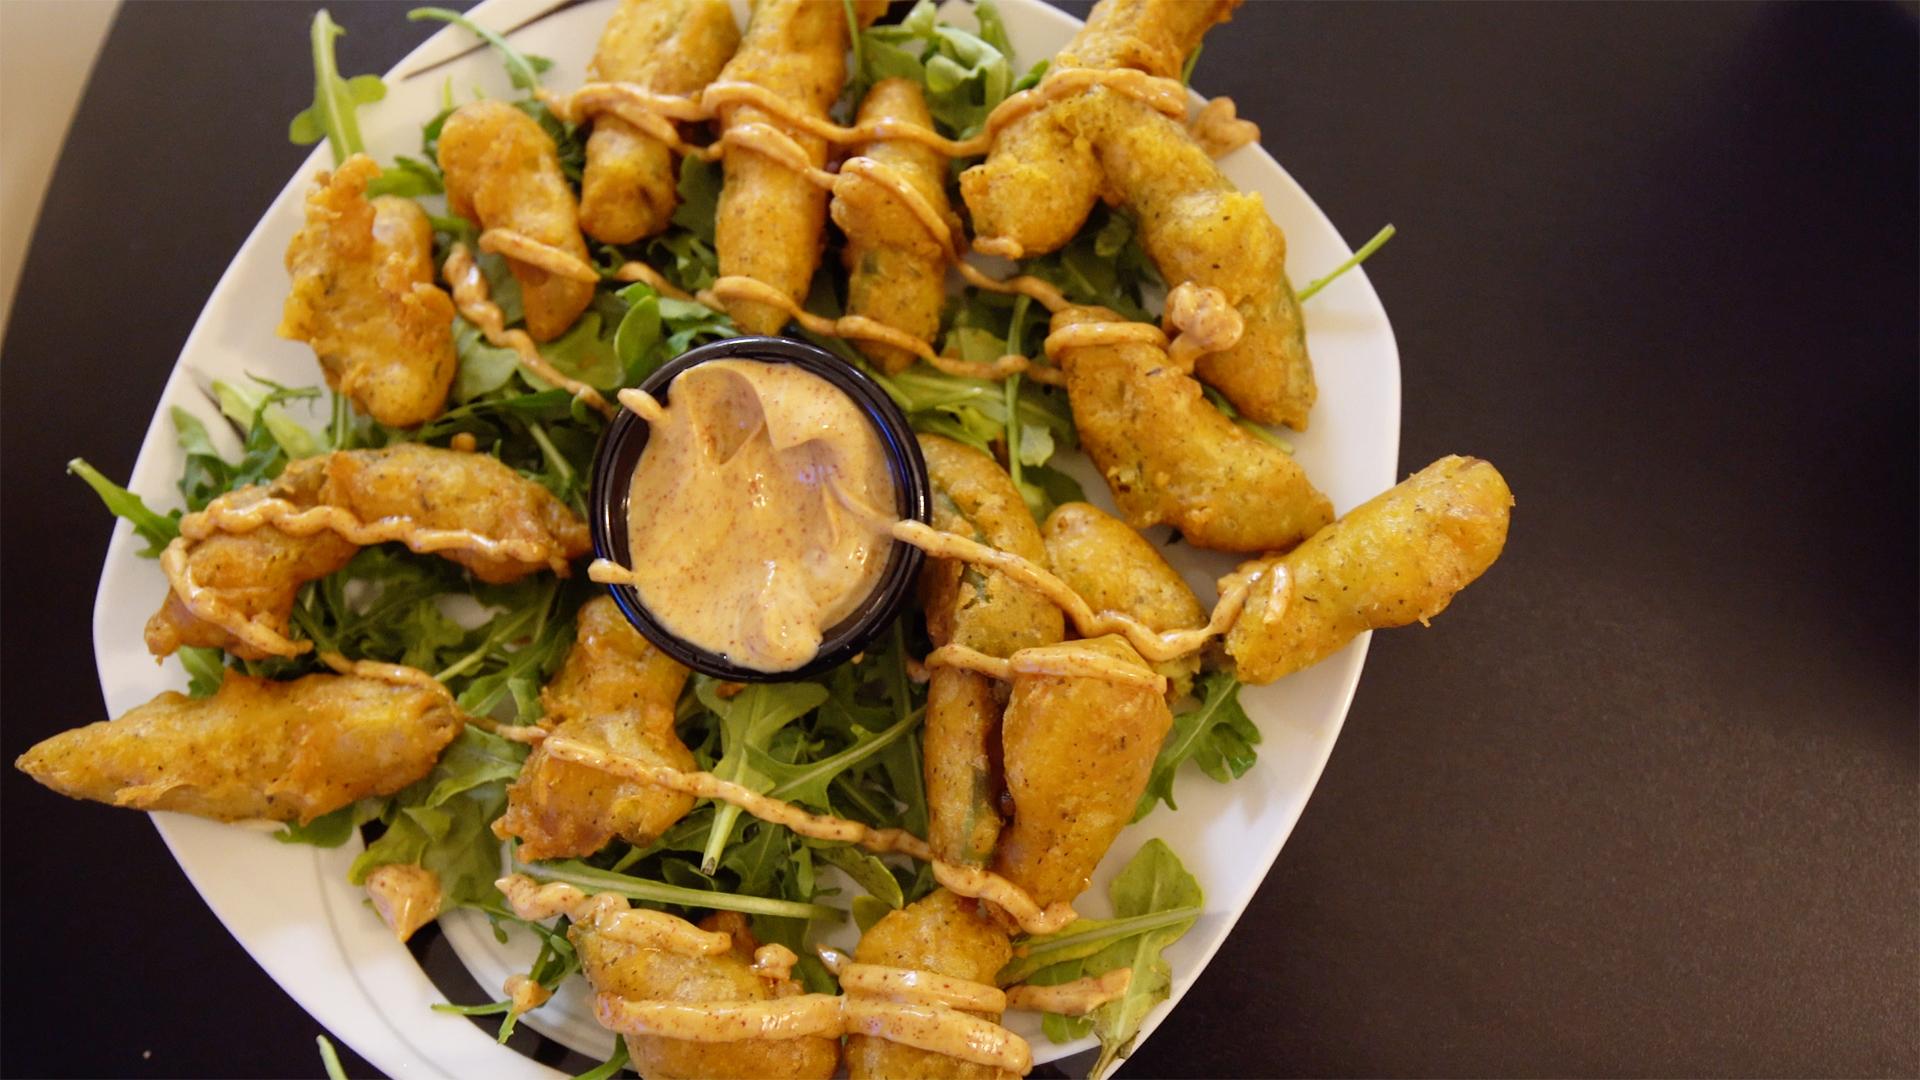 Vegan Meals with Birch Bark Eatery